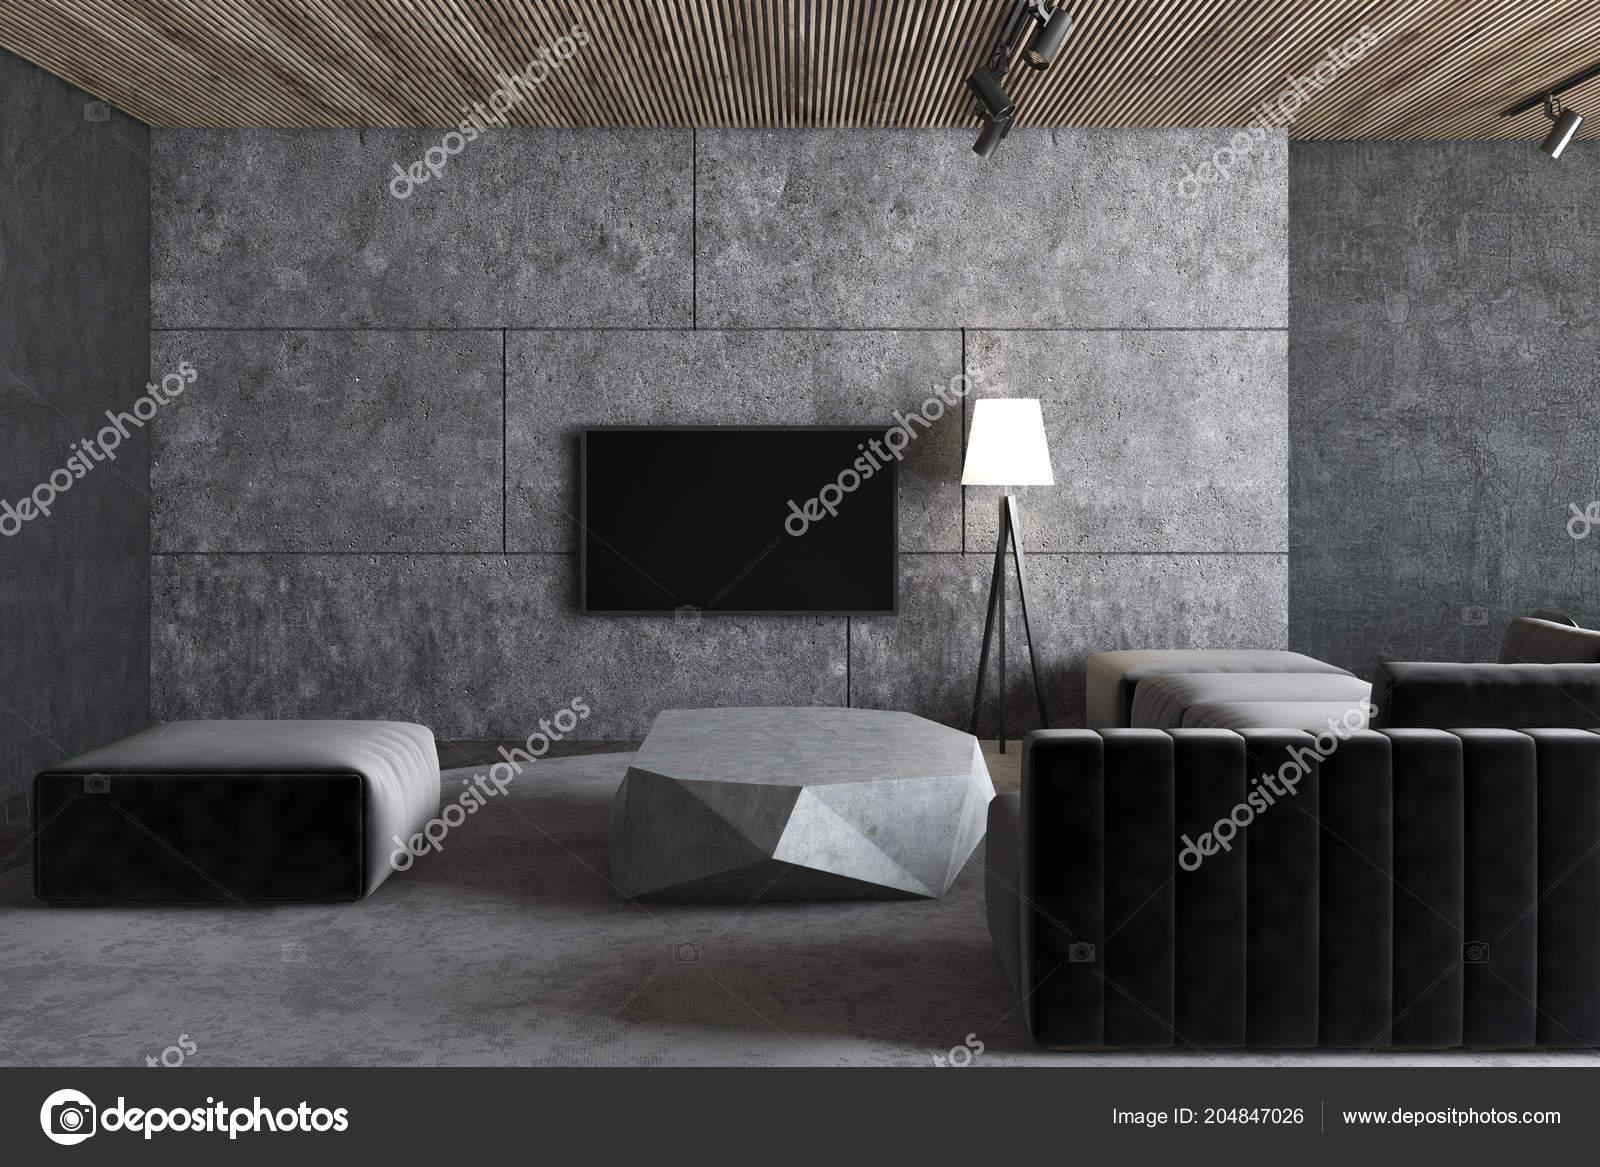 Concrete Loft Living Room Interior Gray Floor Dark Gray ...